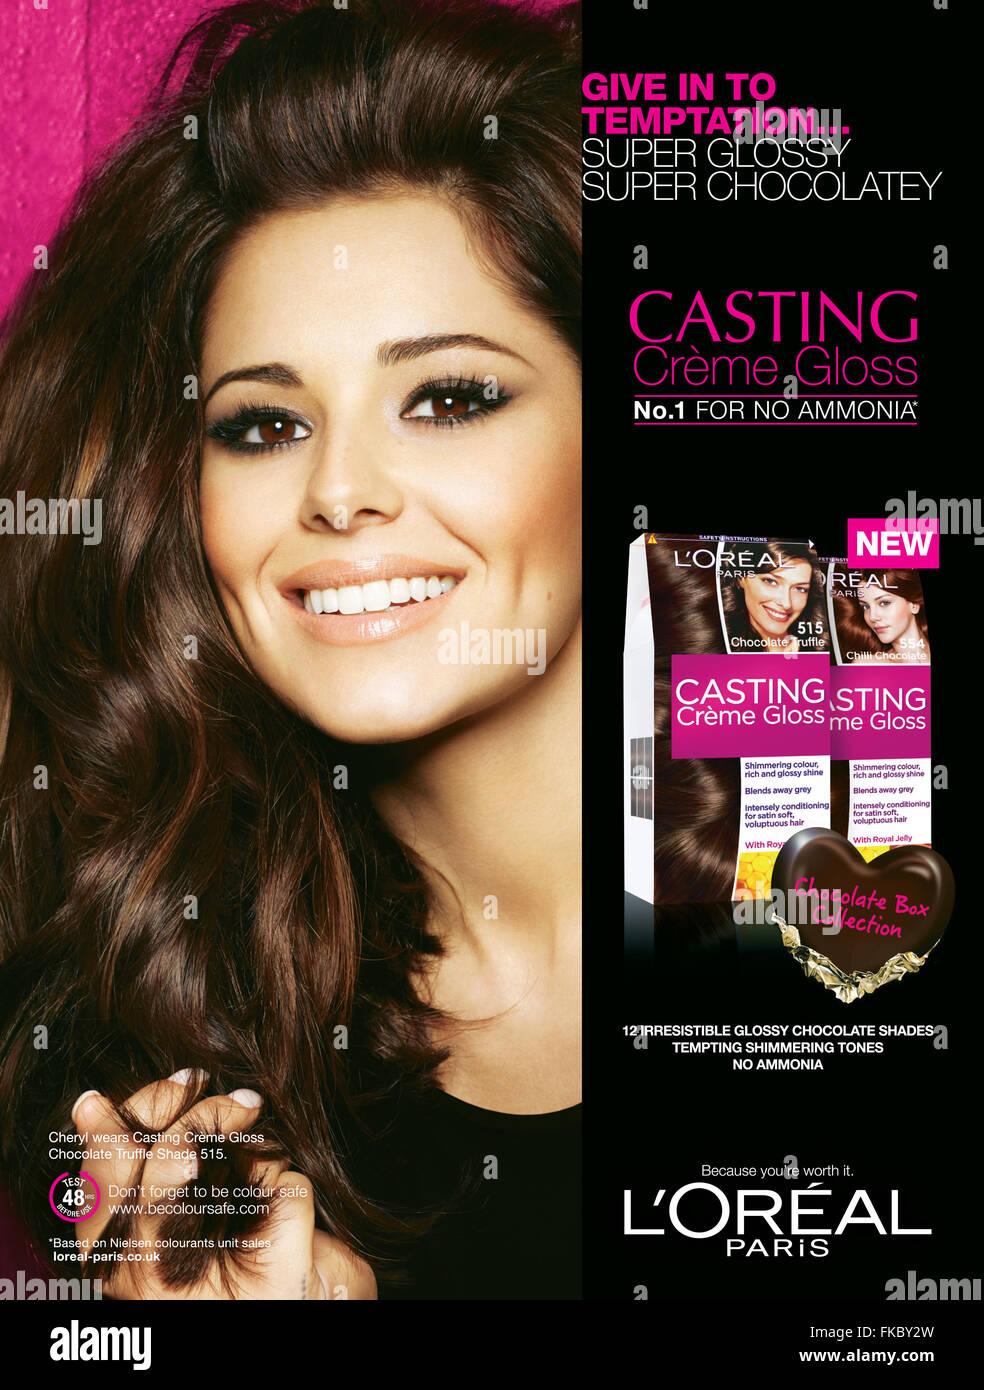 2010s Uk L Oreal Magazine Advert Stock Photo 97993025 Alamy